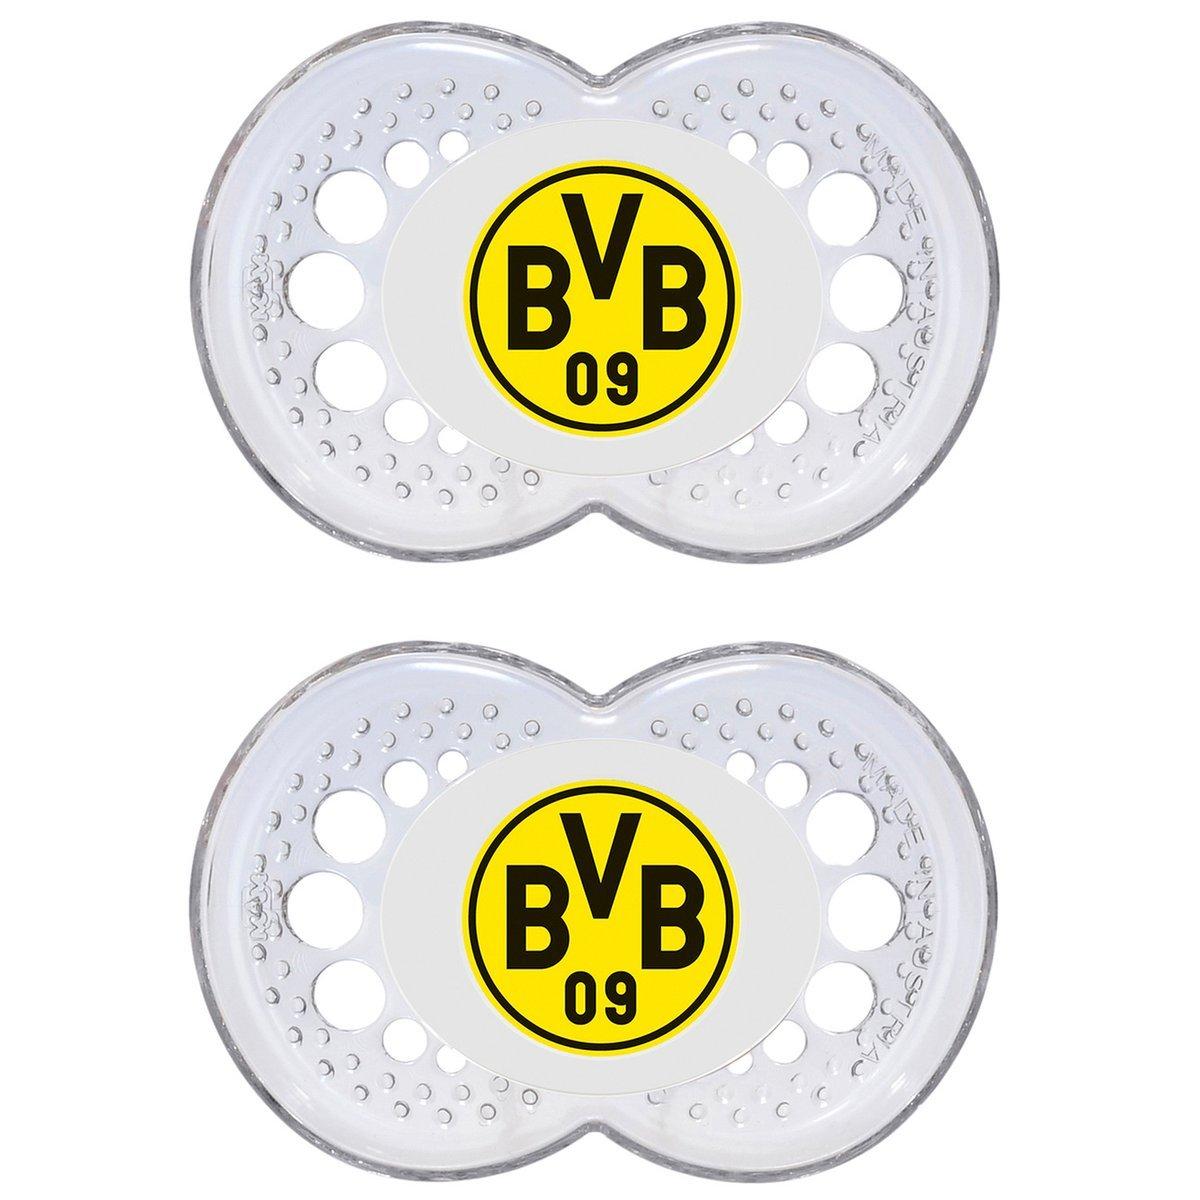 primamma 44576100 - Babyflasche Borussia Dortmund 250ml Silikon Gr. 1